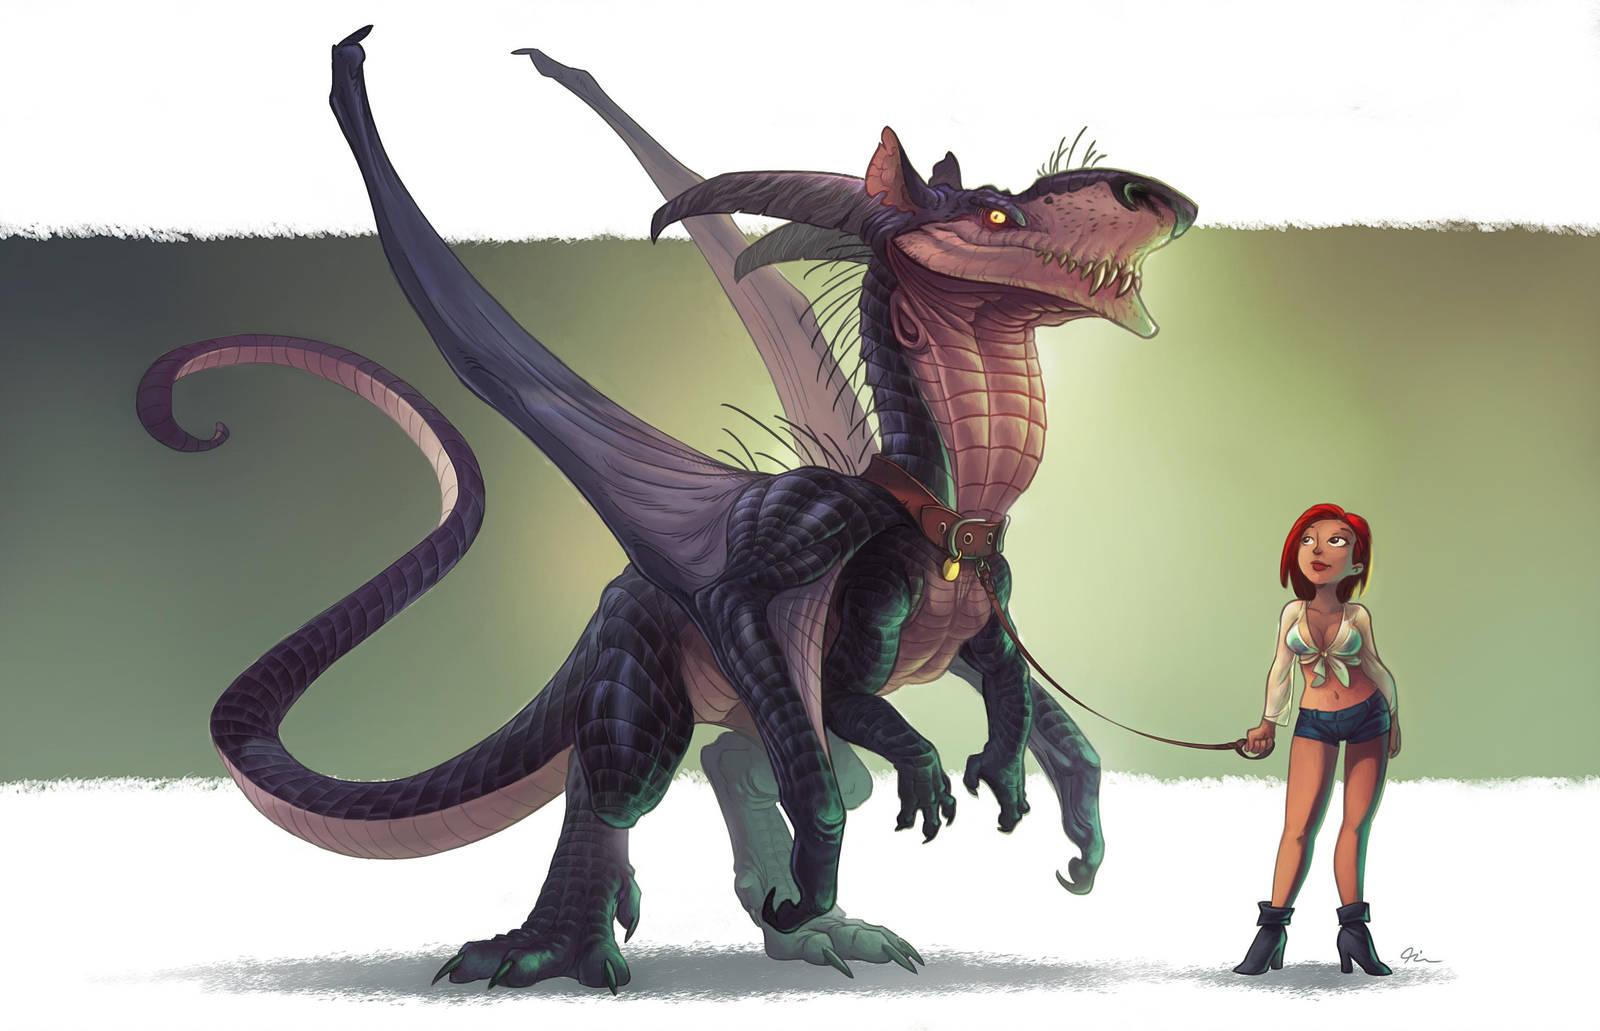 Rat Dragon by Timooon